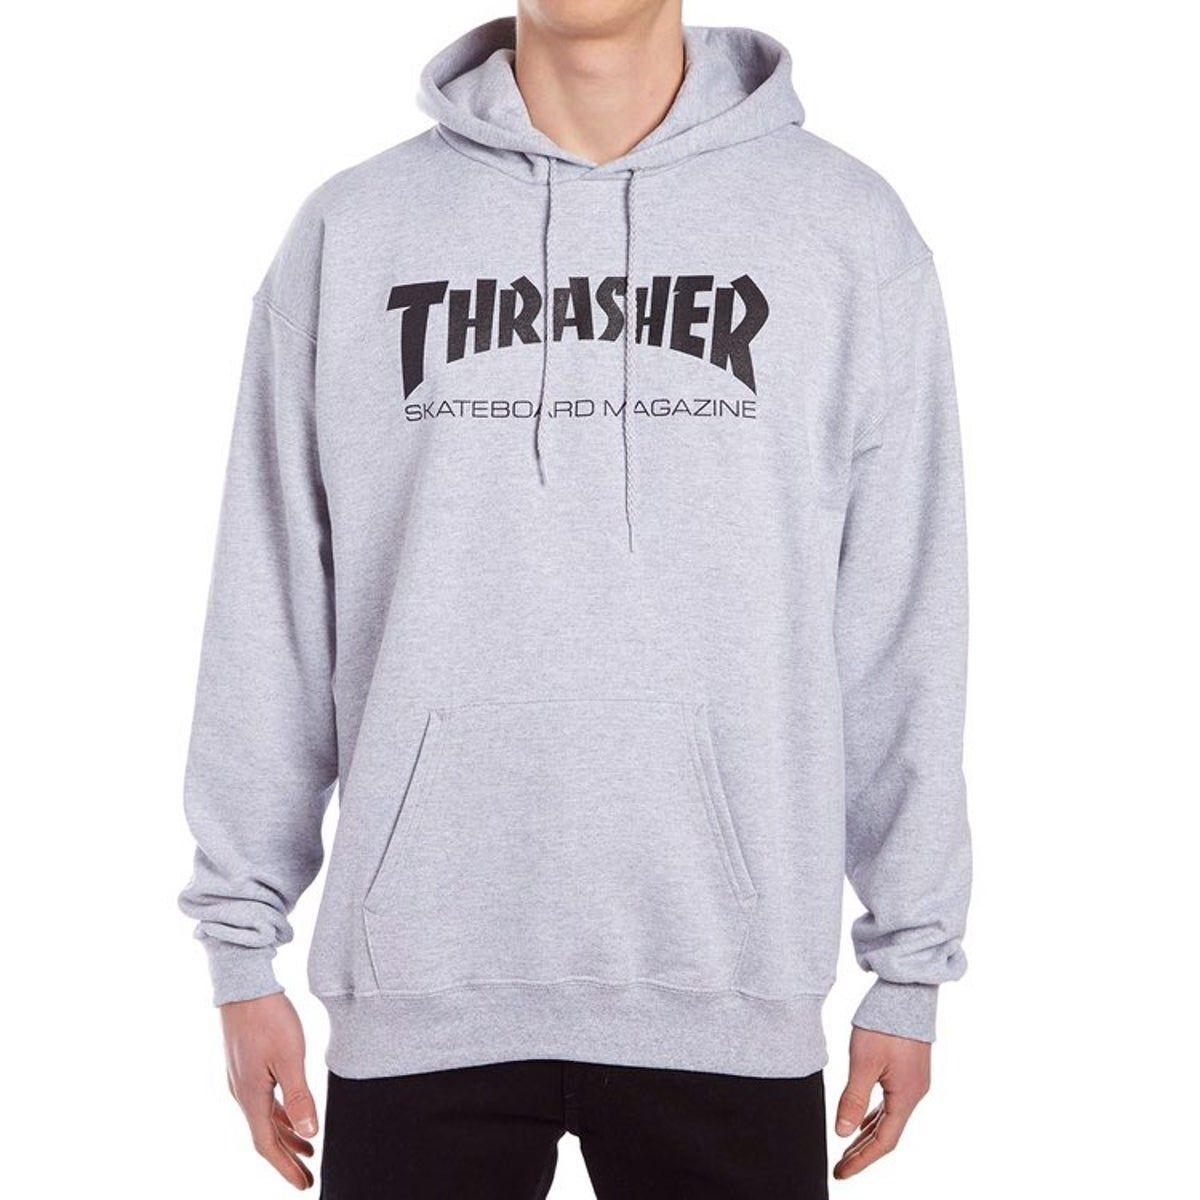 Thrasher Hoodie On Mercari In 2021 Hoodies Thrasher Hoodie Thrasher Skate [ 1200 x 1200 Pixel ]